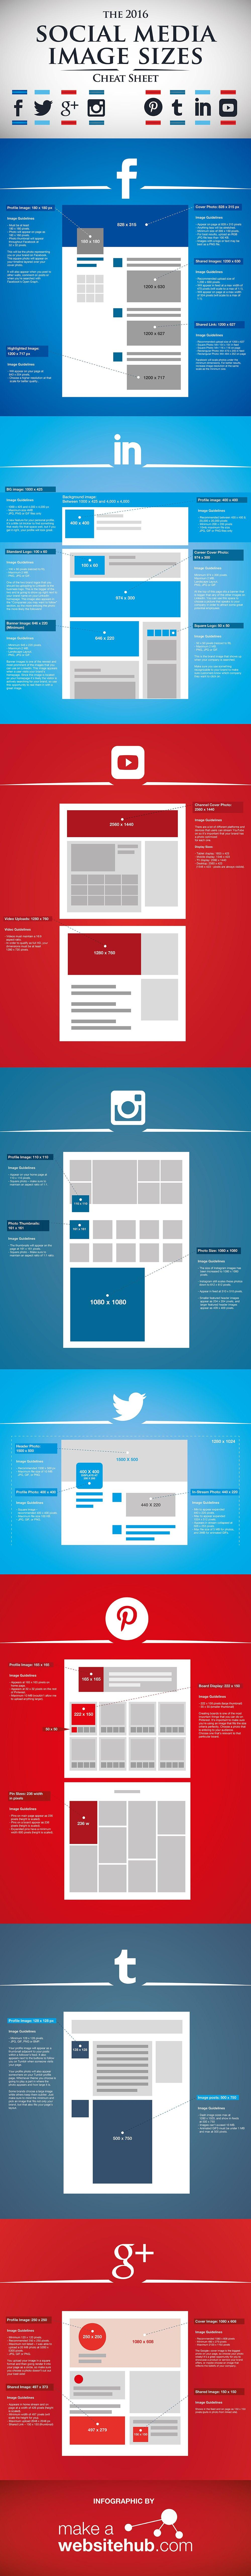 social-media-image-sizes-2016-2